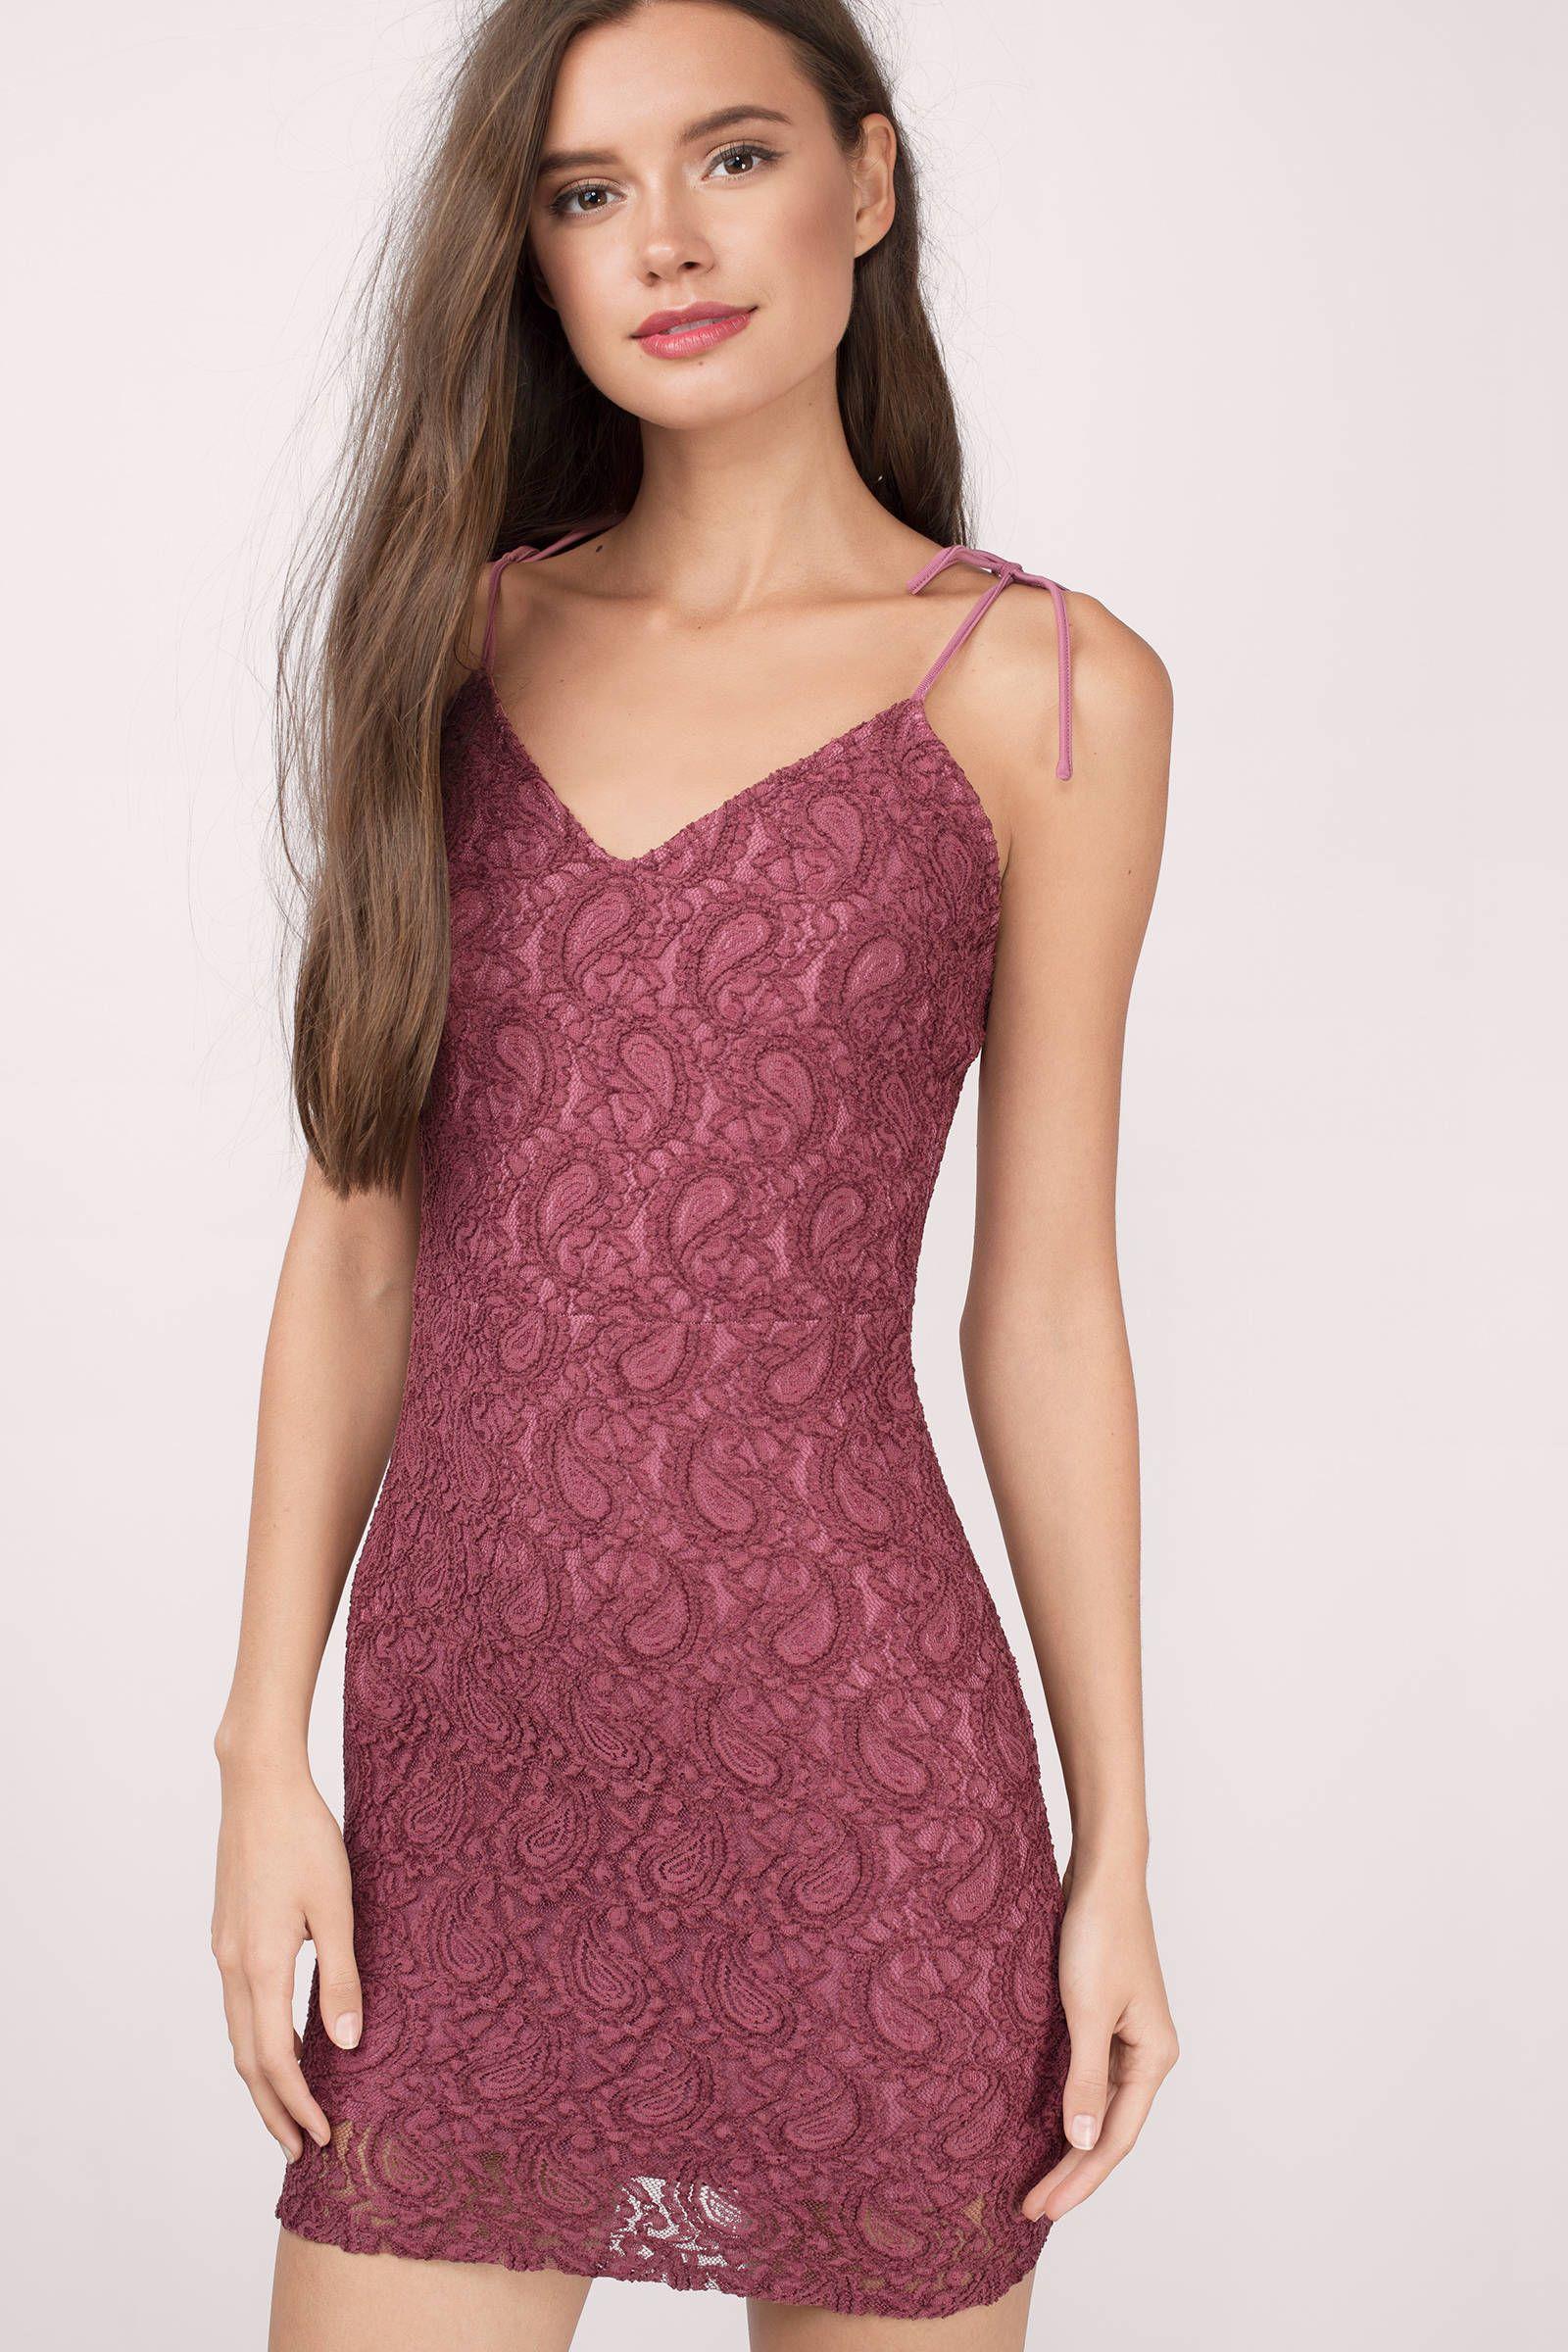 c60fc2c6d34b Cool Intentions Lace Bodycon Dress | Dresses | Pinterest | Bodycon ...